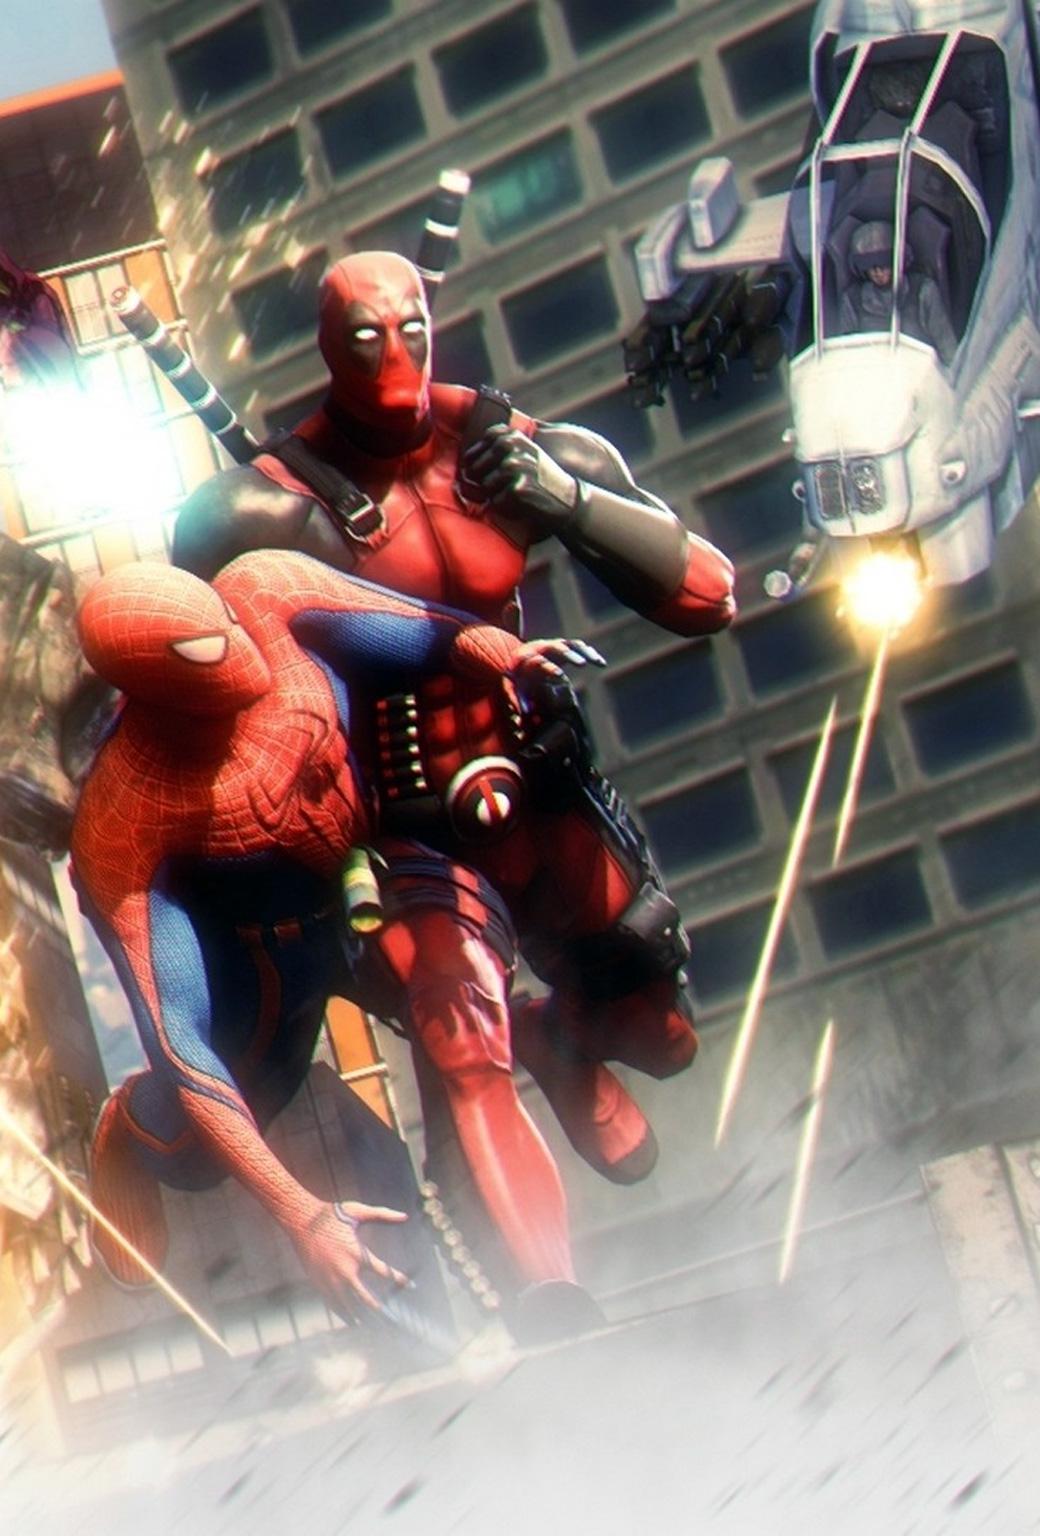 Deadpool and Spiderman Wallpaper - WallpaperSafari Deadpool Vs Spiderman Wallpaper 1920x1080